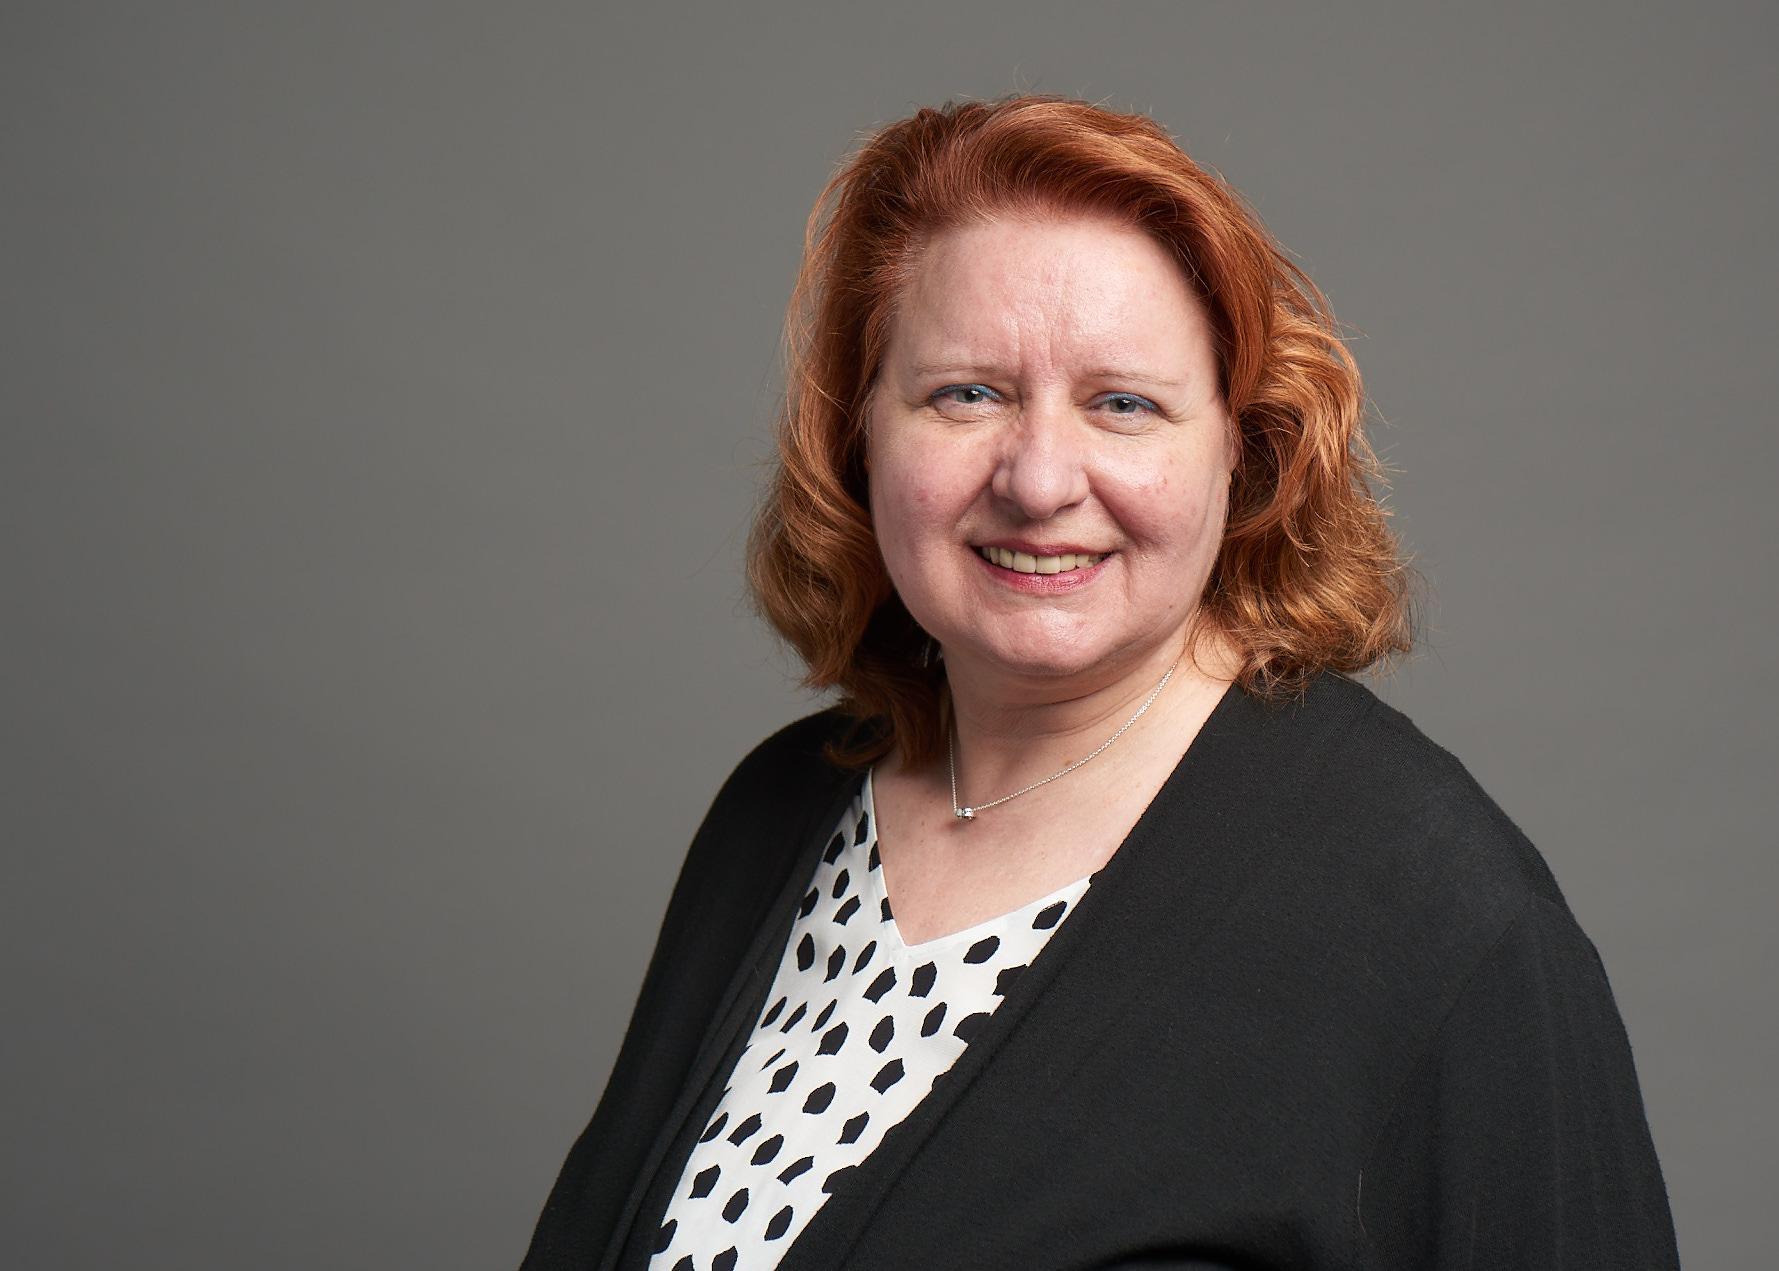 Berufsberaterin Sabine Winter